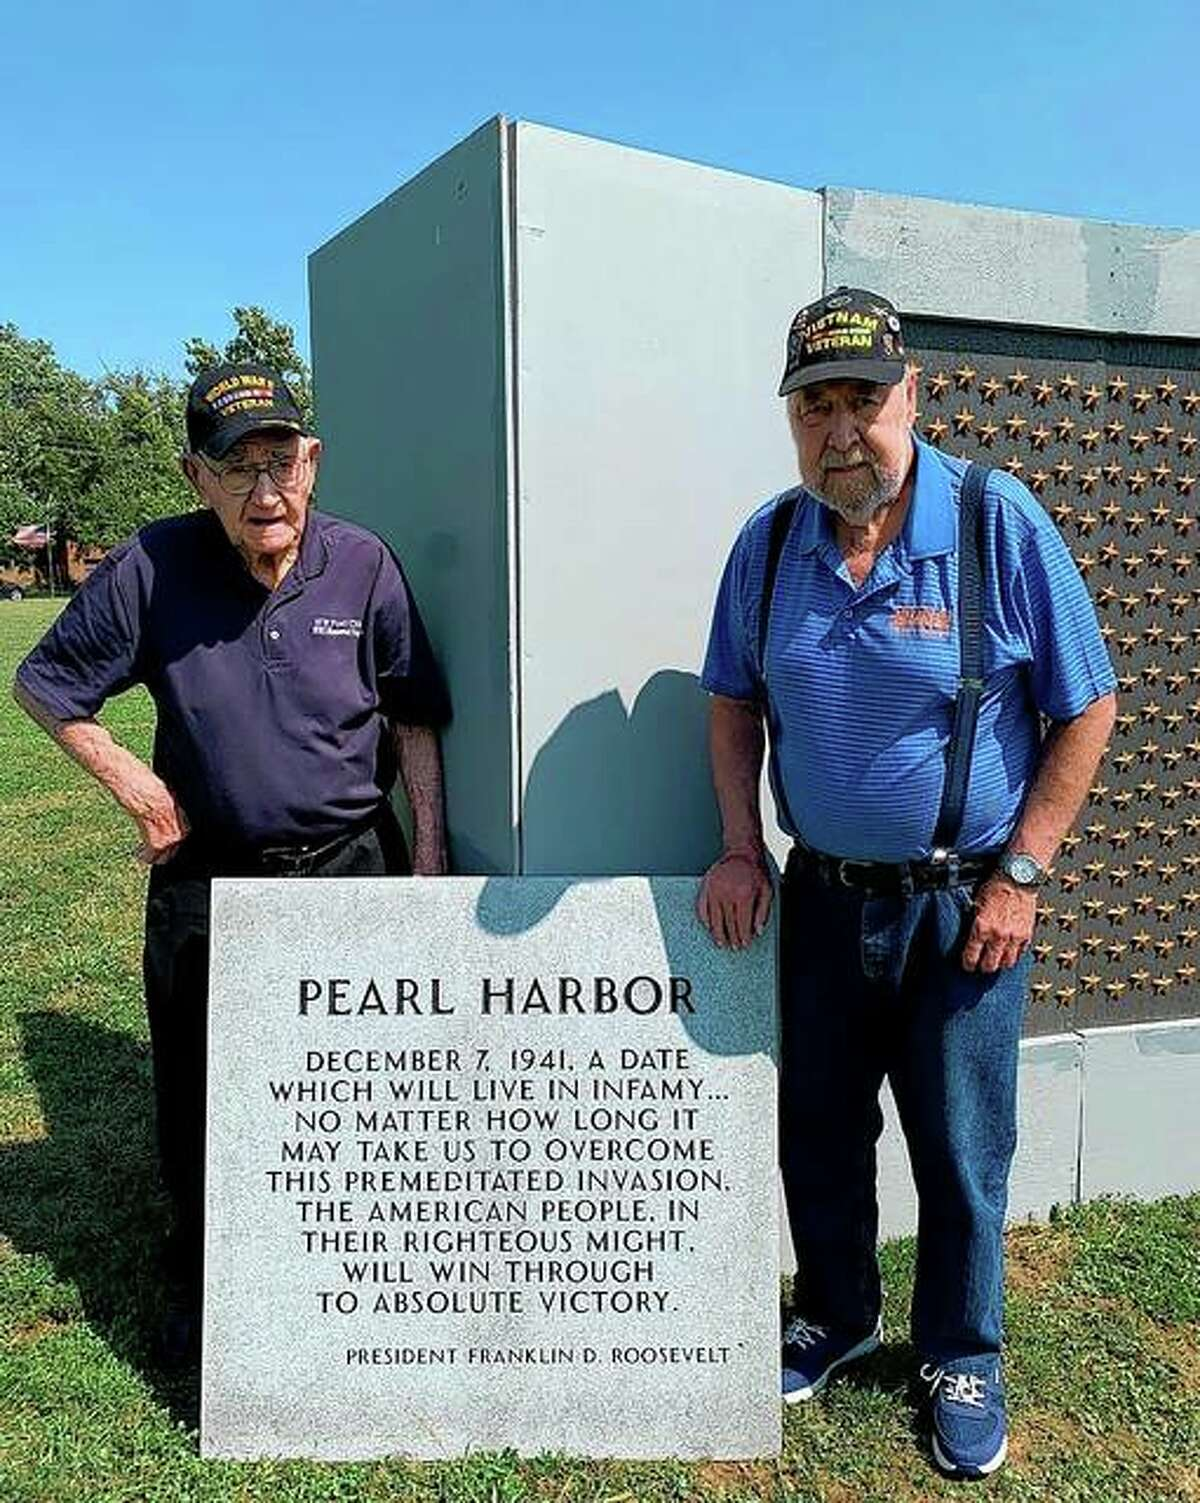 World War II veteran Charles Weishaar (left), 101, and his son, Steve Weishaar, who served in Vietnam as a combat medic, visit the traveling World War II memorial this past weekend at Prairie Land Heritage Museum.